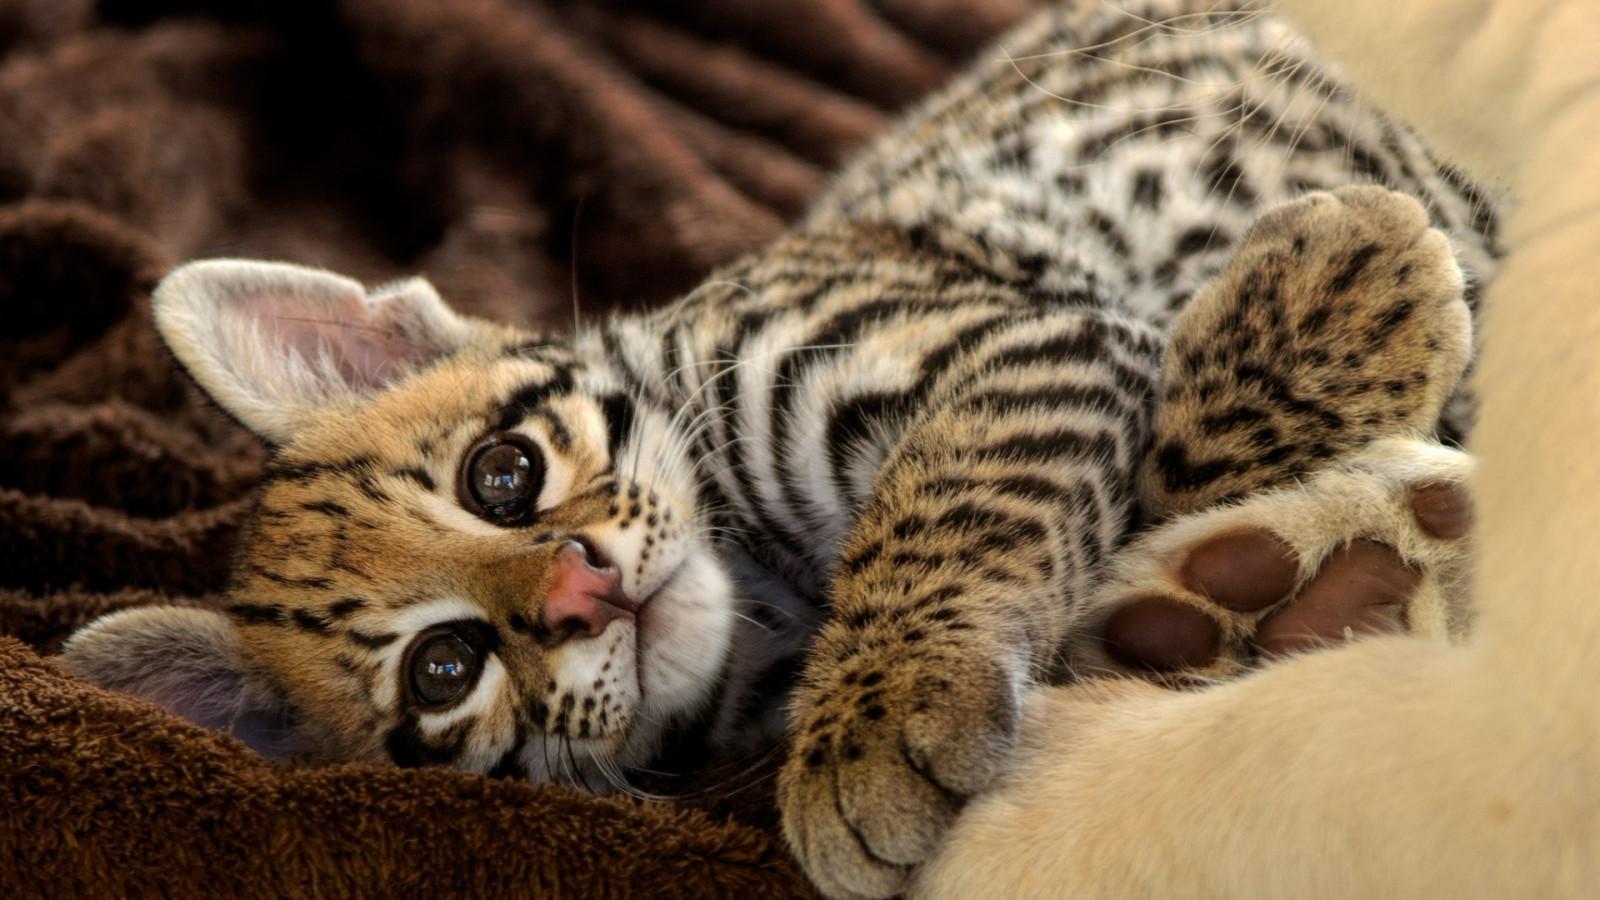 Small Ocelot Like Cat